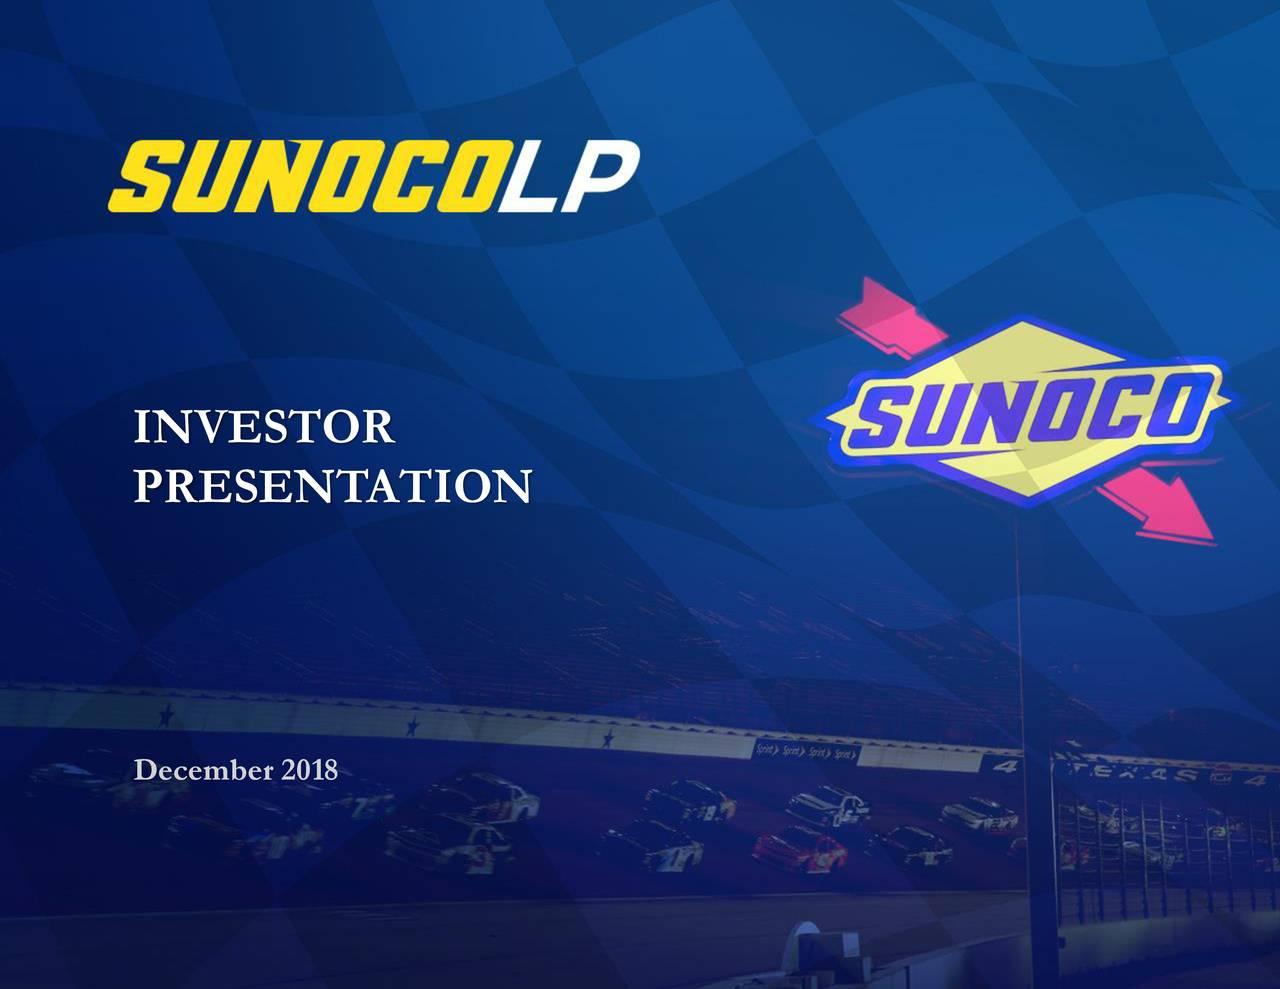 Sunoco (SUN) Investor Presentation - Slideshow - Sunoco LP